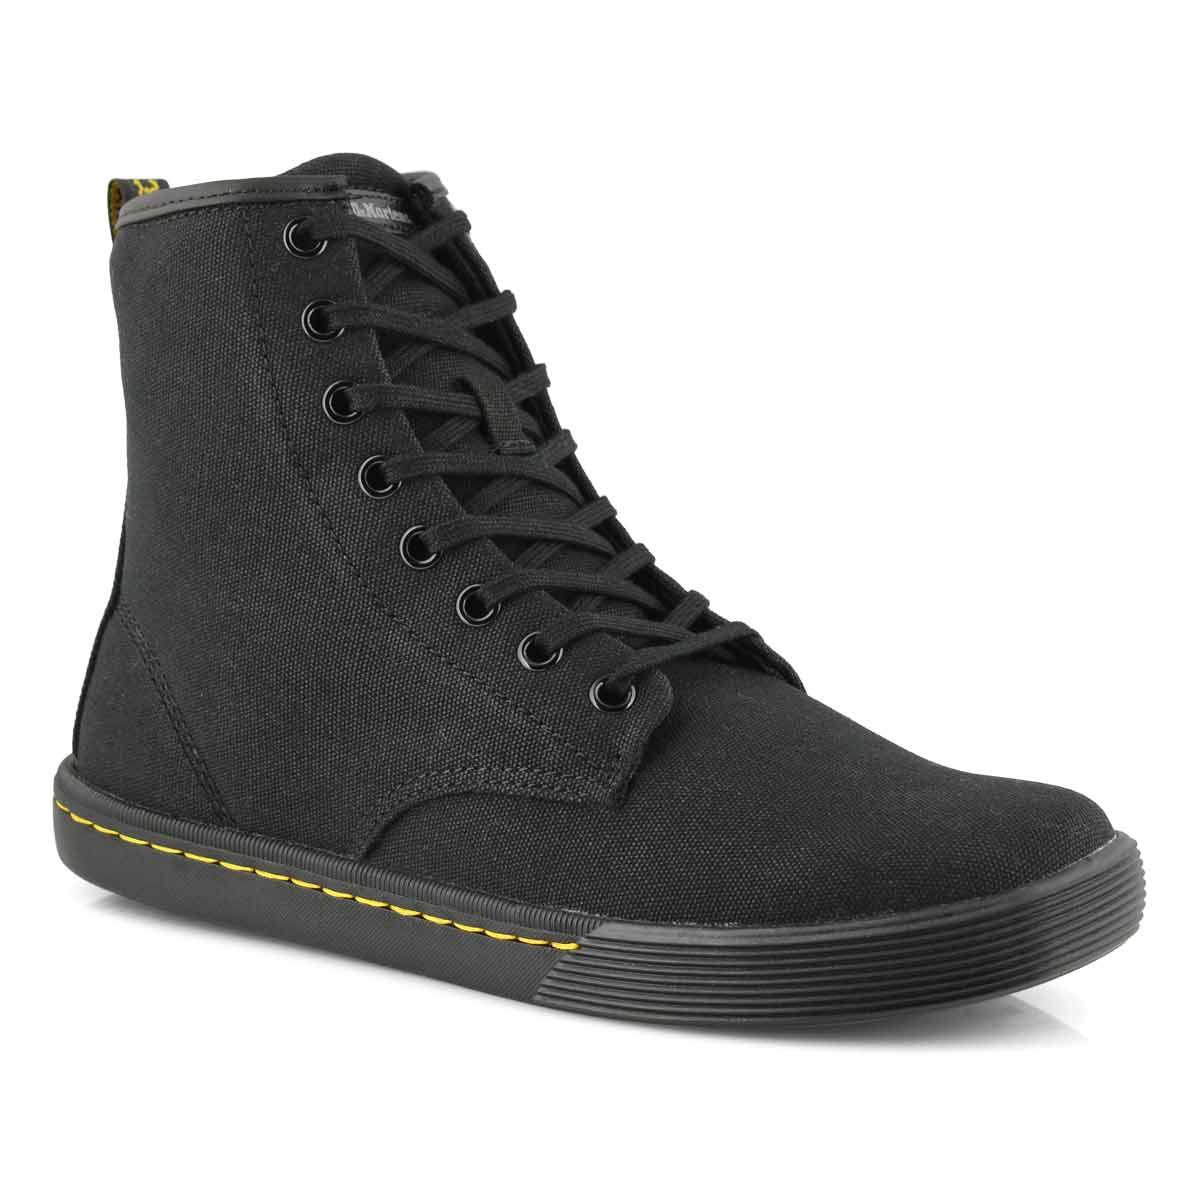 Lds Sheridan black 8 eye boot